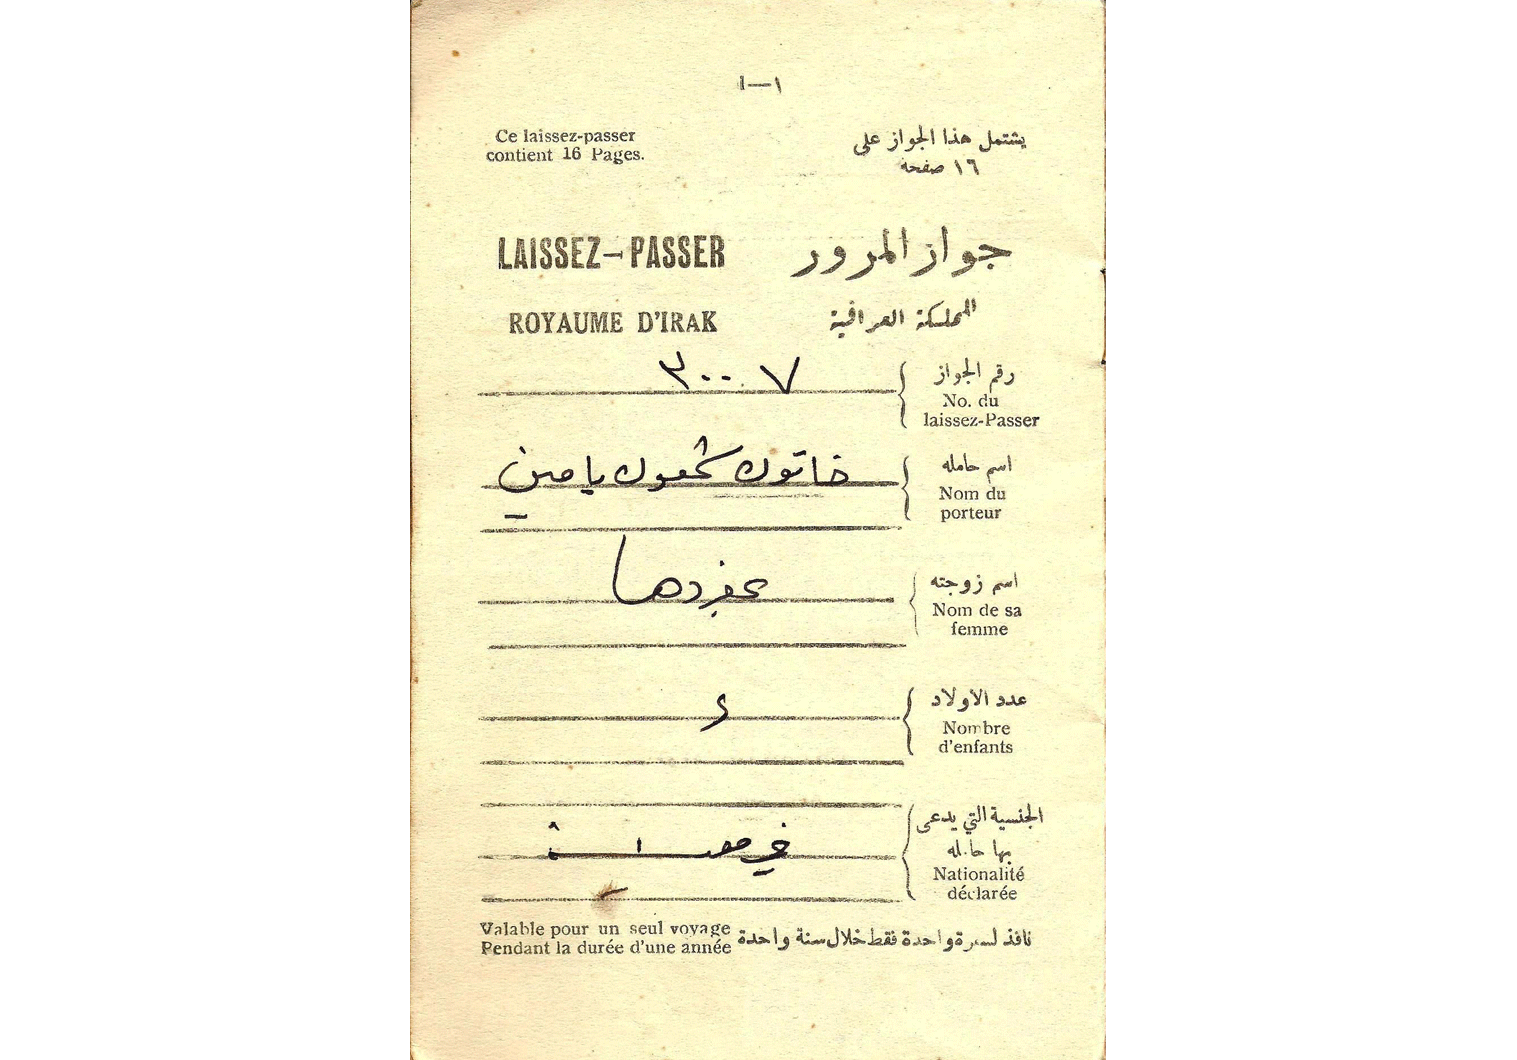 1951 Jewish laissez passer